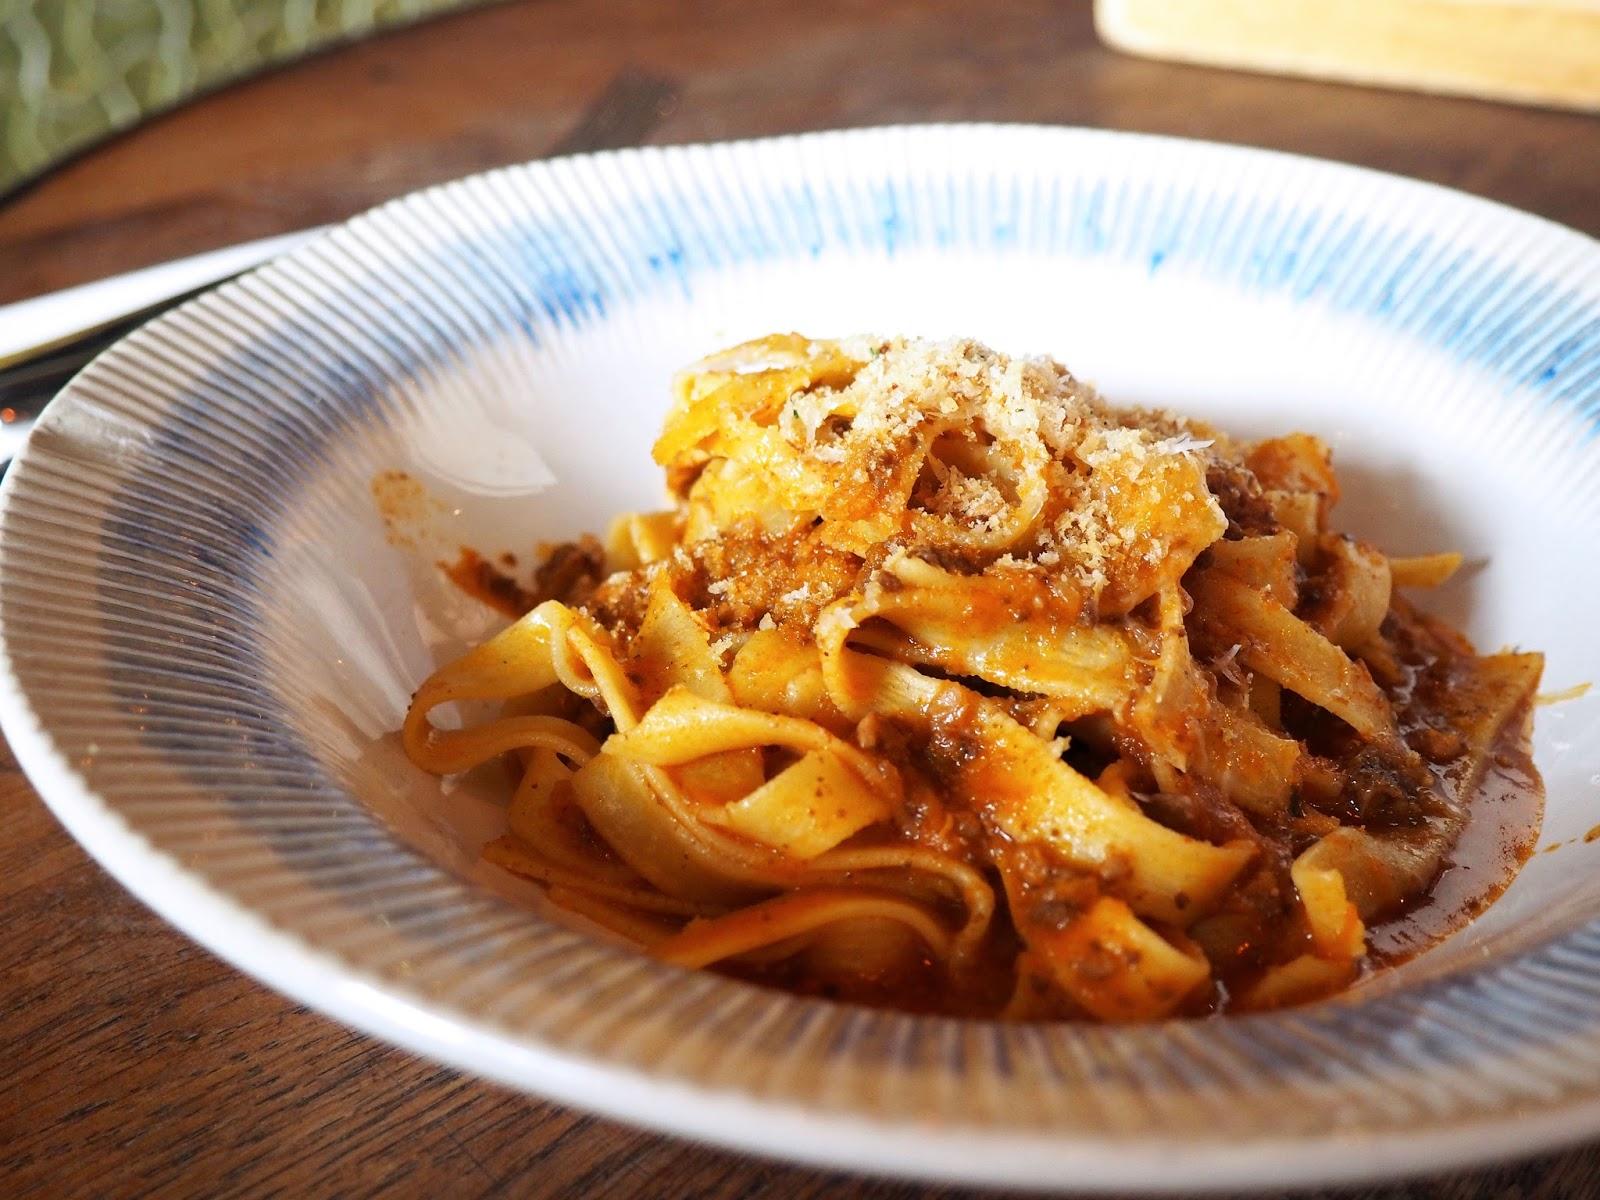 Jamie's Italian Super Lunch Menu Tagliatelle Bolognese